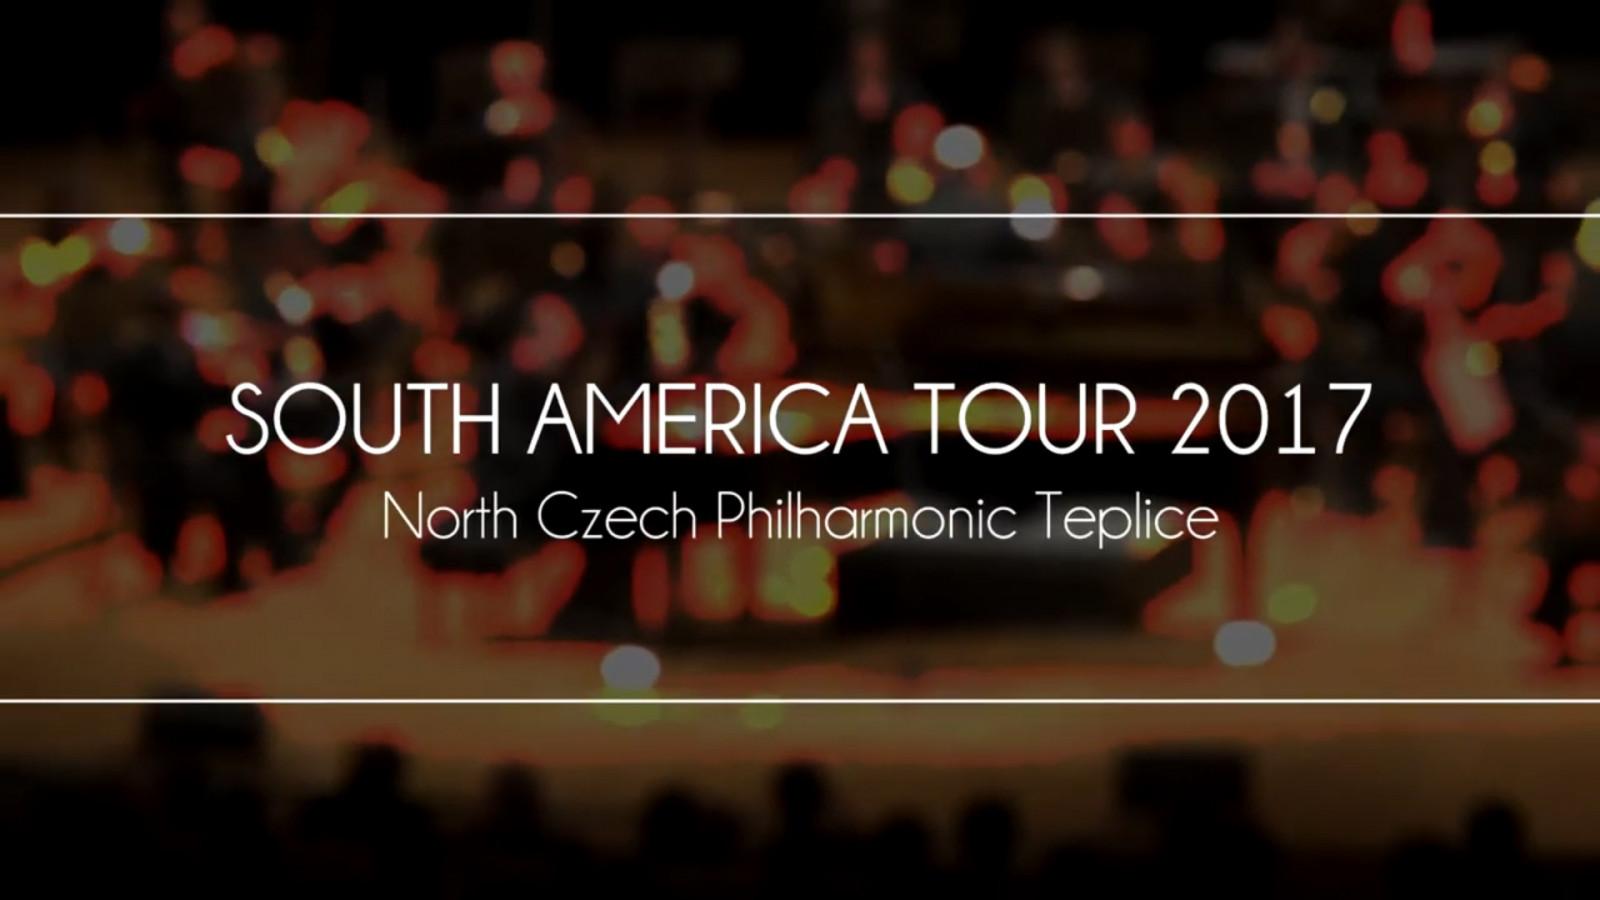 South America tour 2017